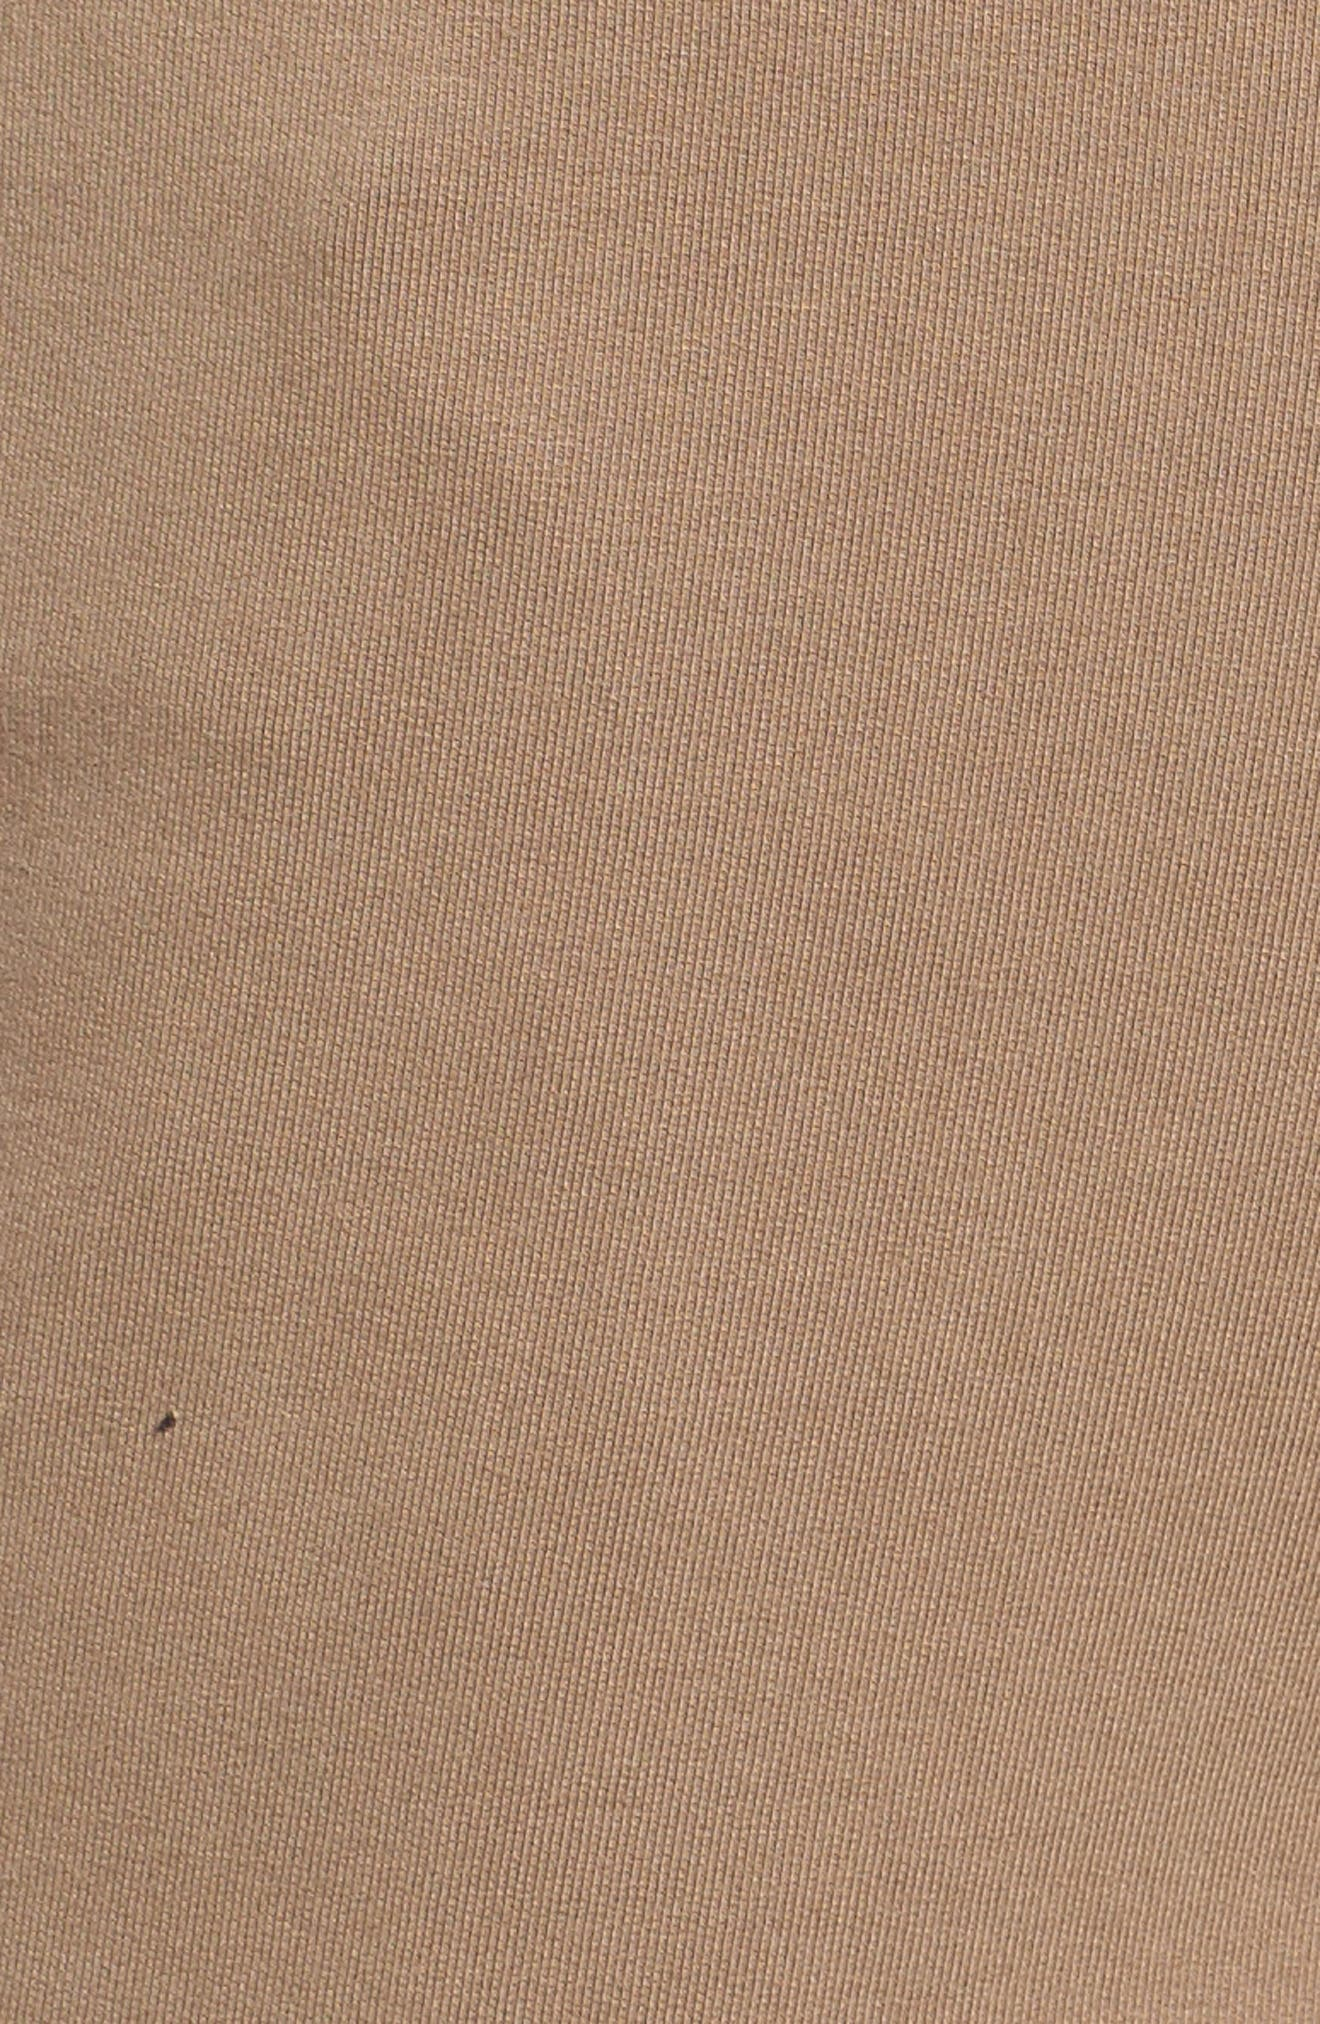 Carlton Knit Cargo Shorts,                             Alternate thumbnail 5, color,                             249